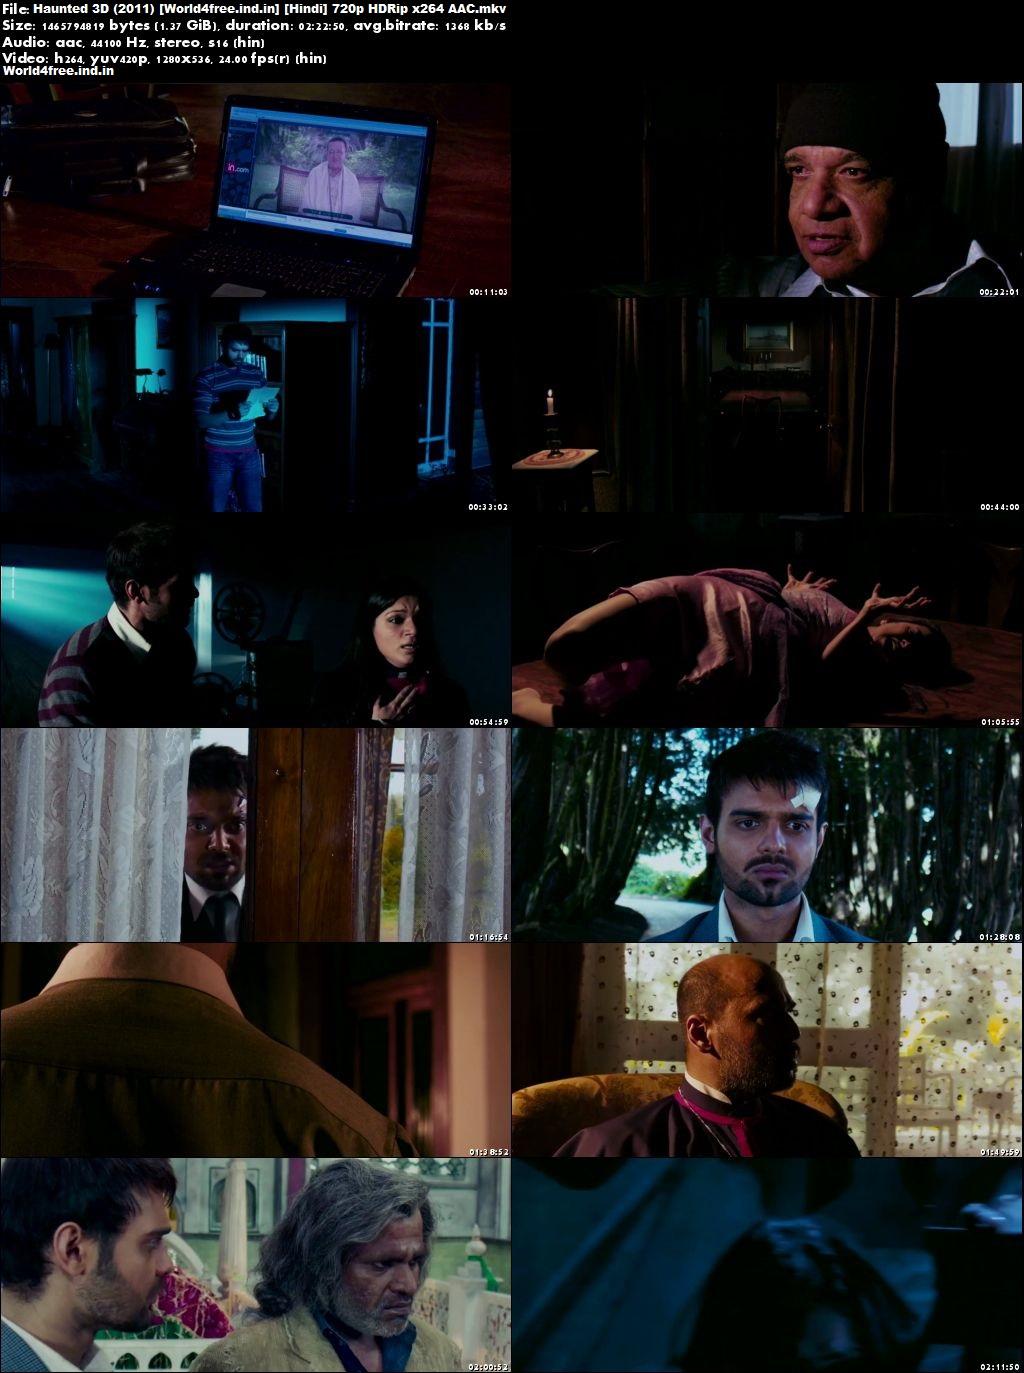 Haunted 3D 2011 bolly4u Full 720p HD Hindi Movie Download